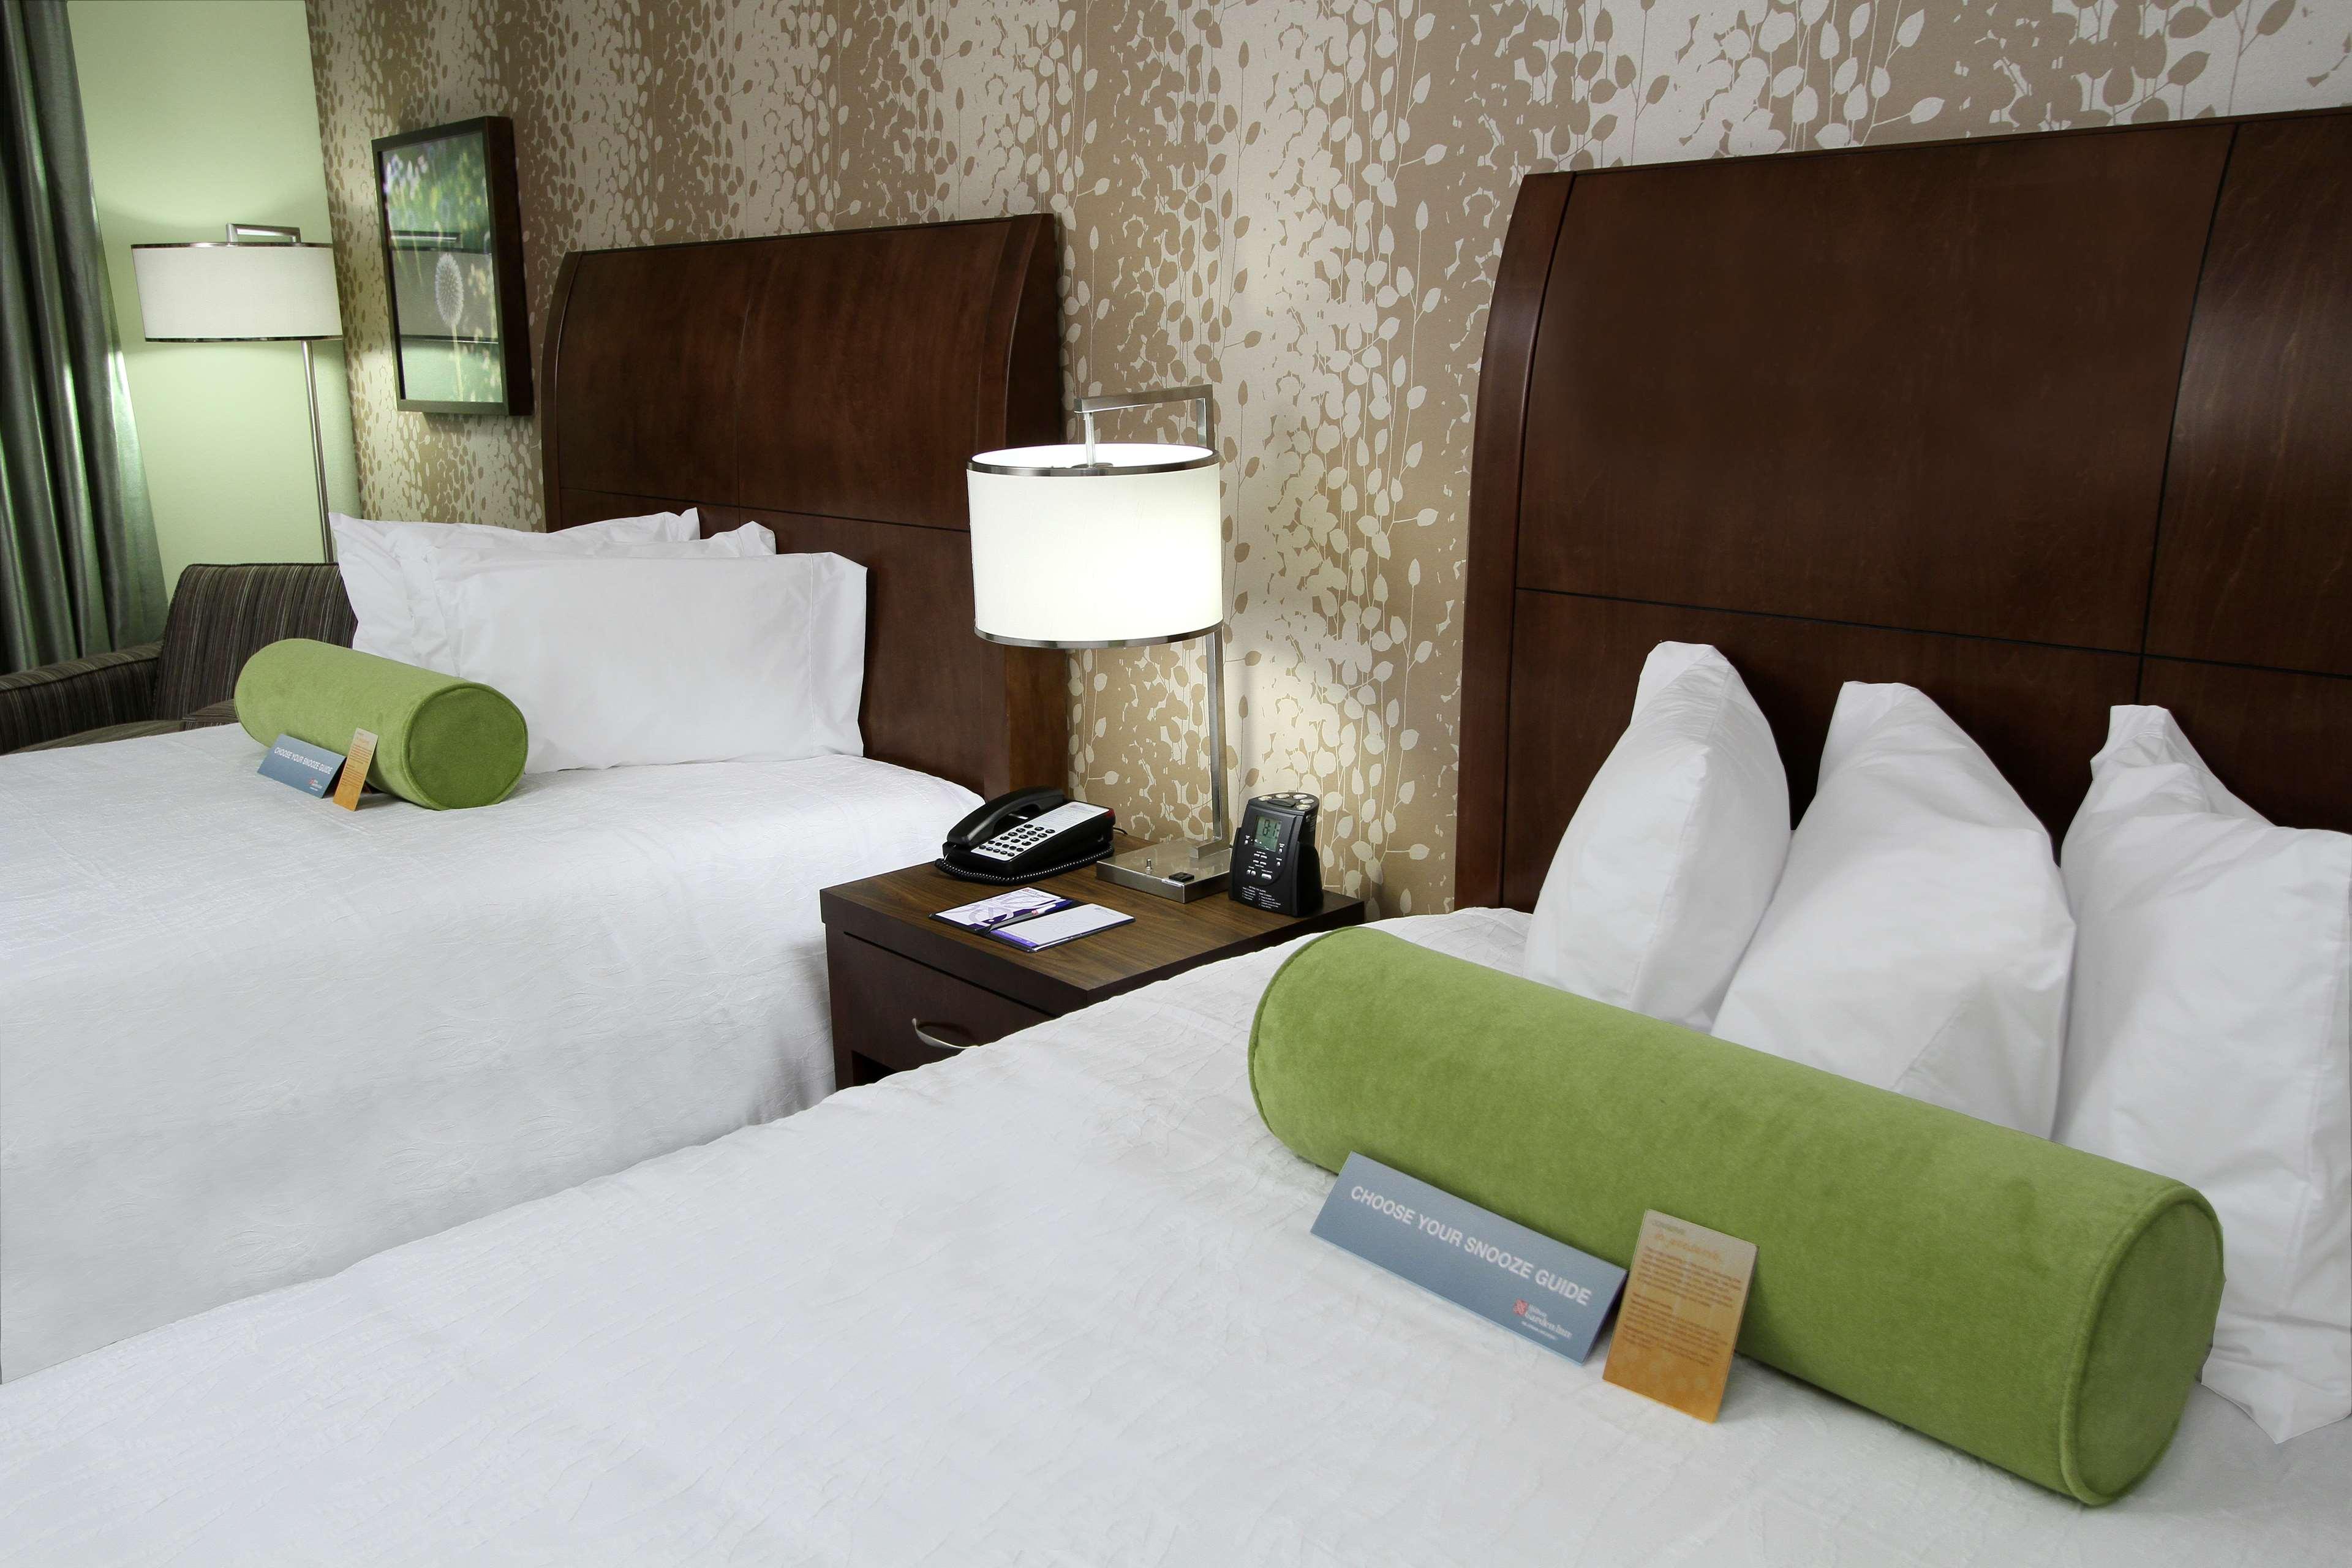 Hilton Garden Inn Covington/Mandeville image 15